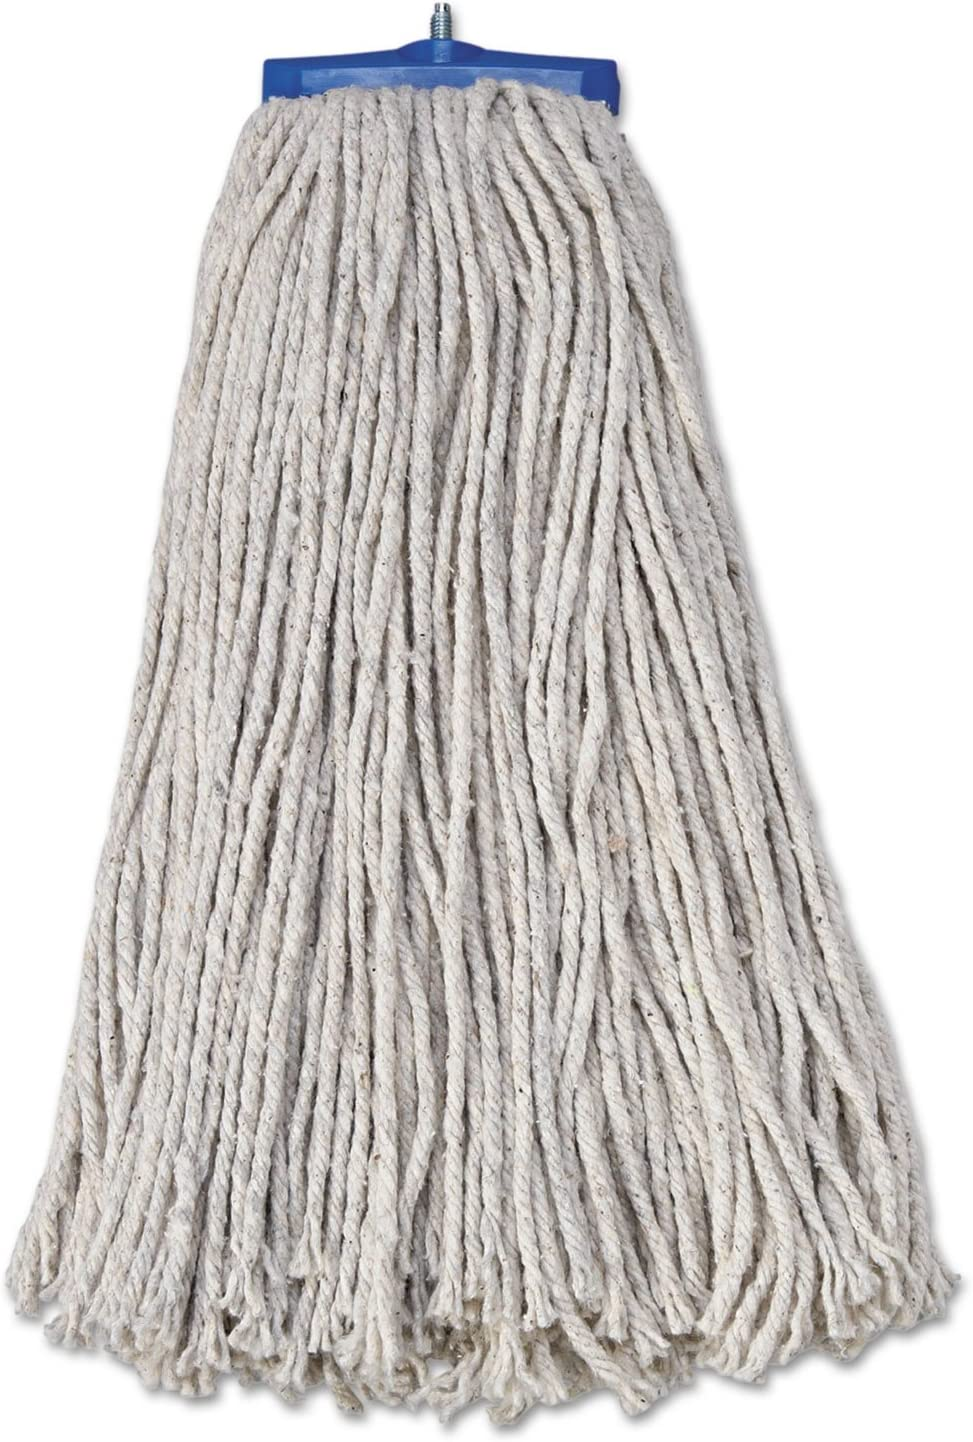 Boardwalk 720C Mop Head Fiber Cotton SEAL limited product Economical Lie-Flat 5 ☆ popular